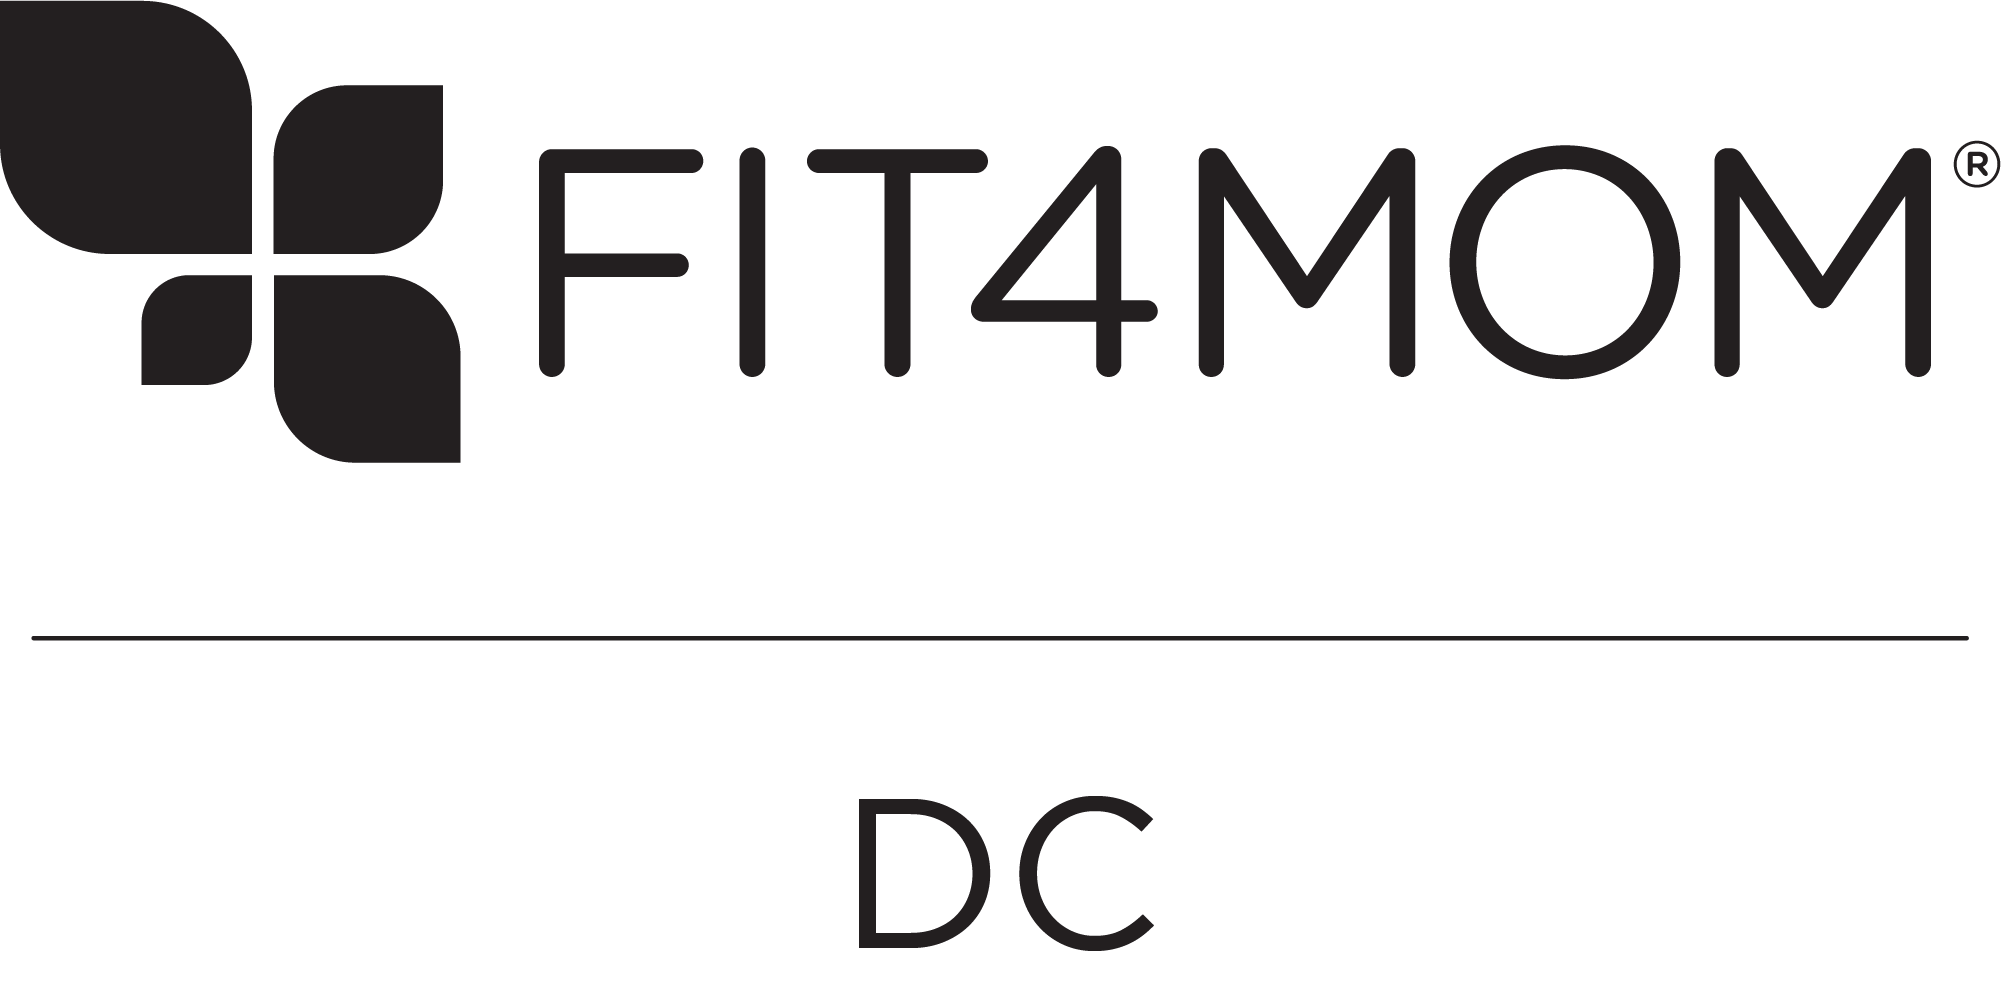 F4M-Photo Overlay-Franchise-Vert-BLK-DC-9313.png